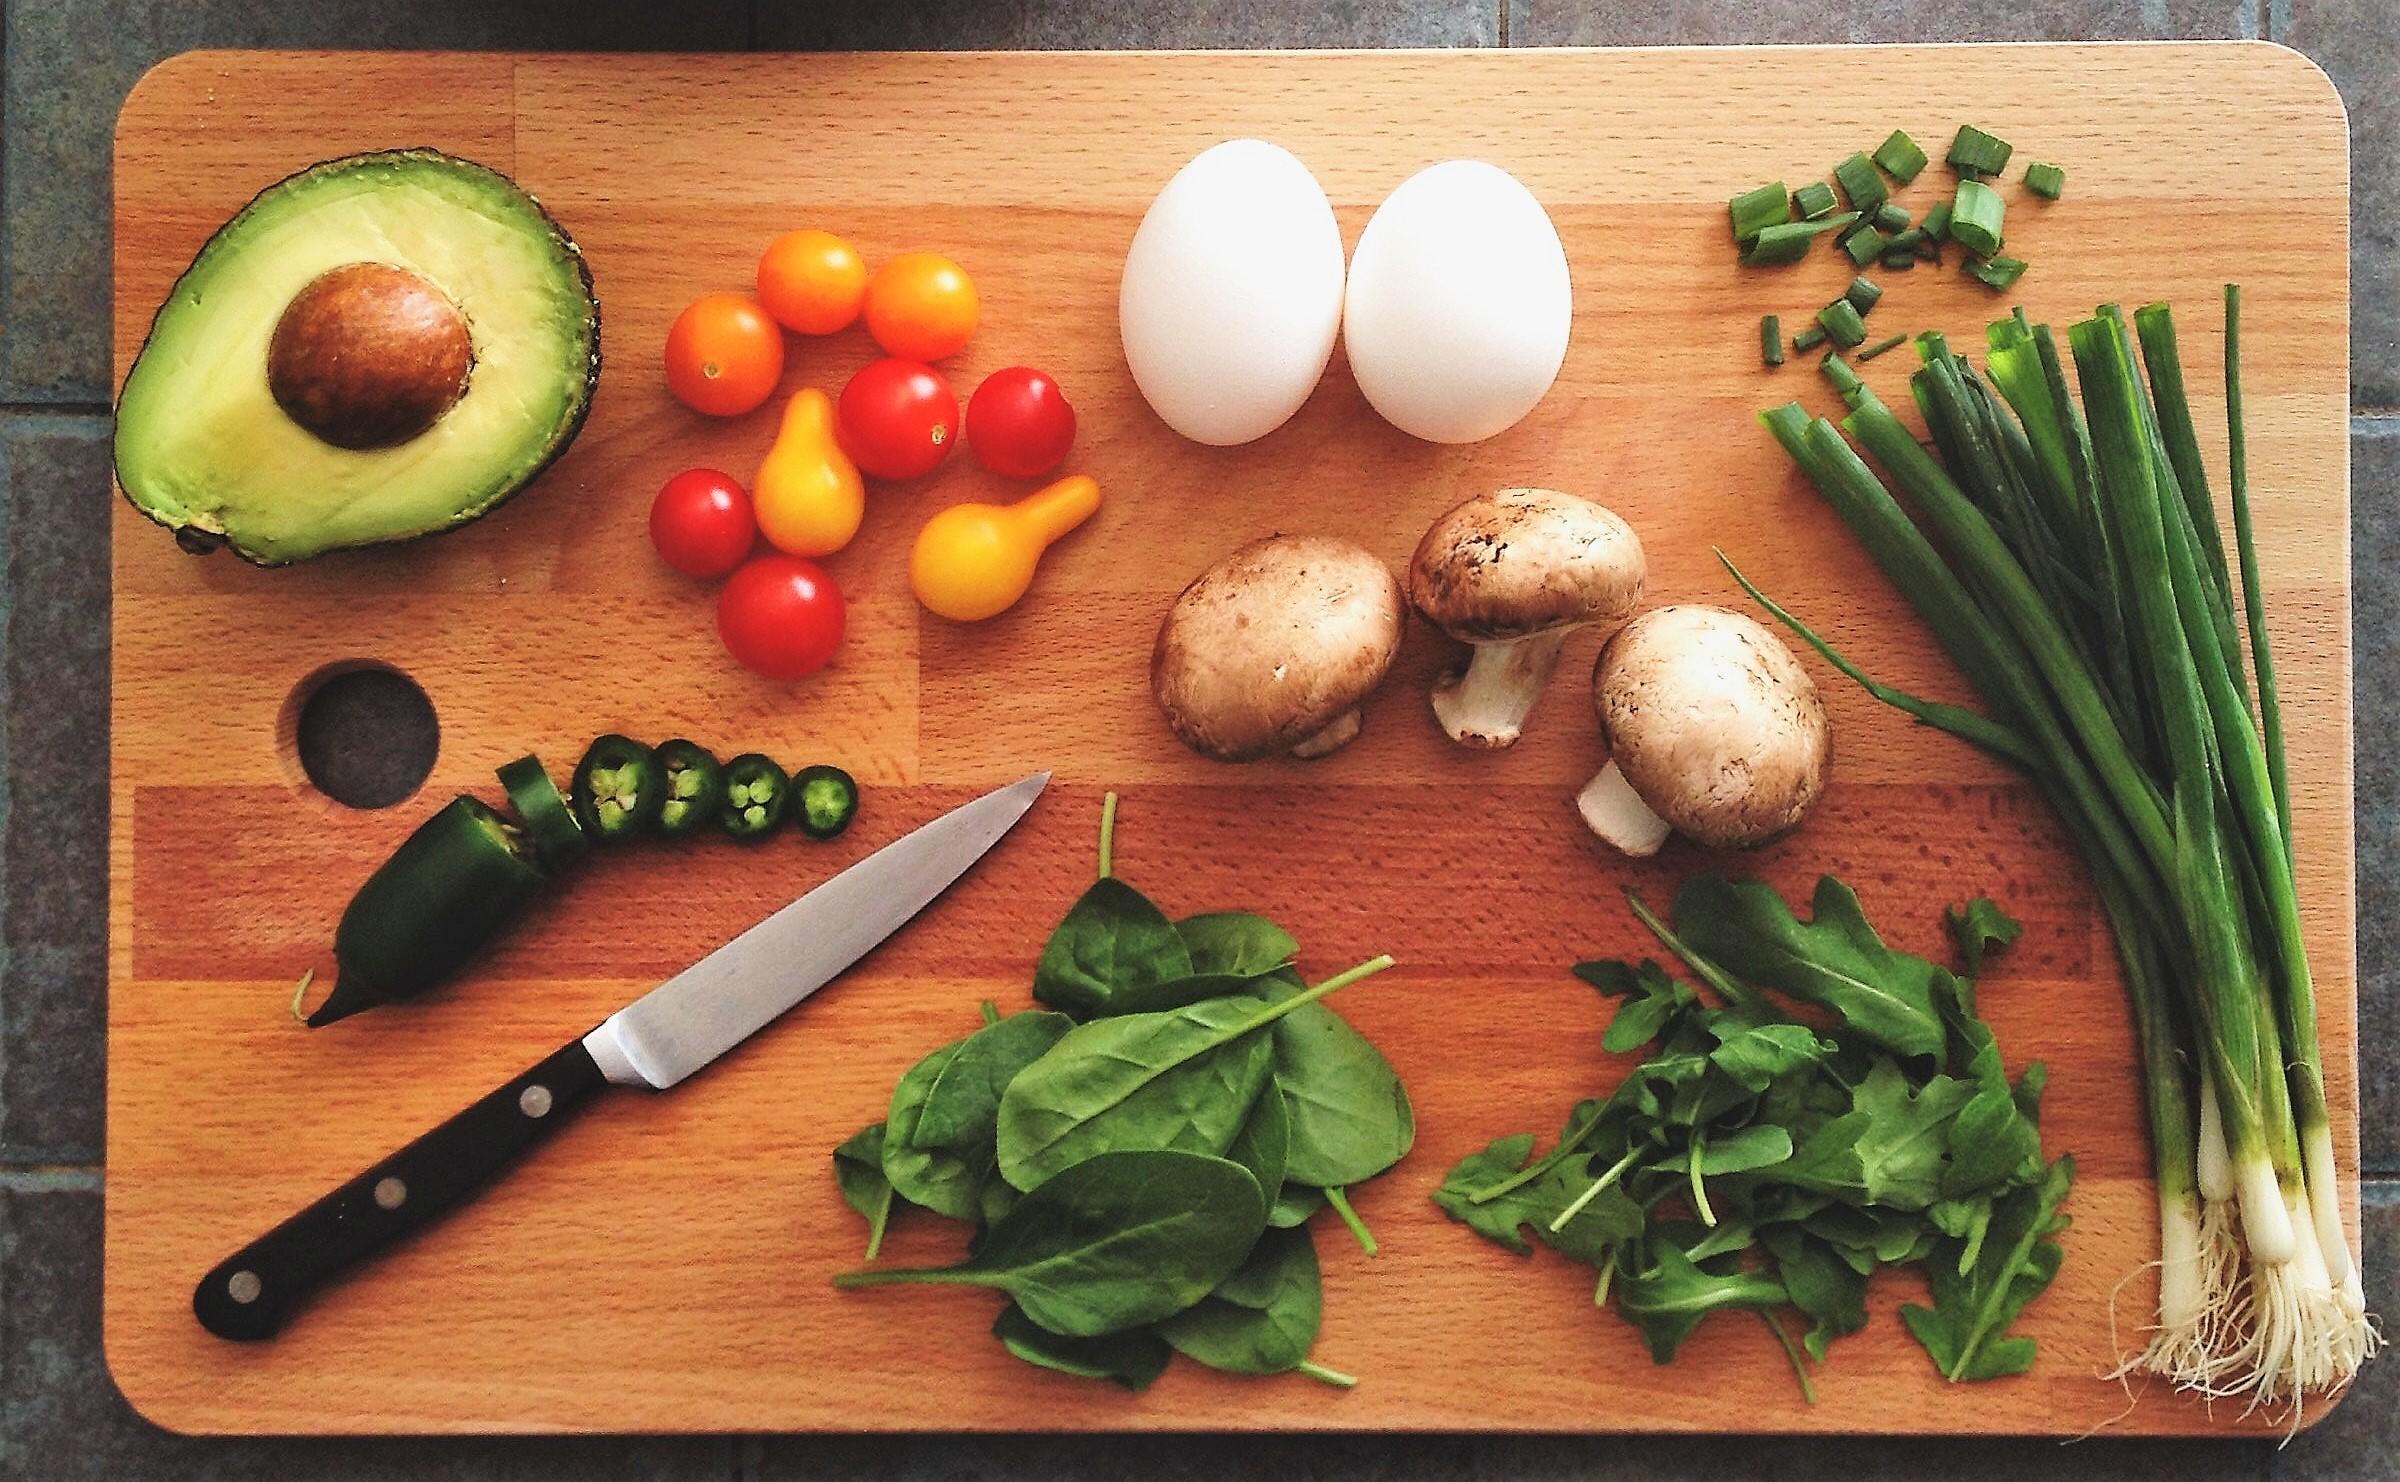 kitchen-cutting-board-veggies